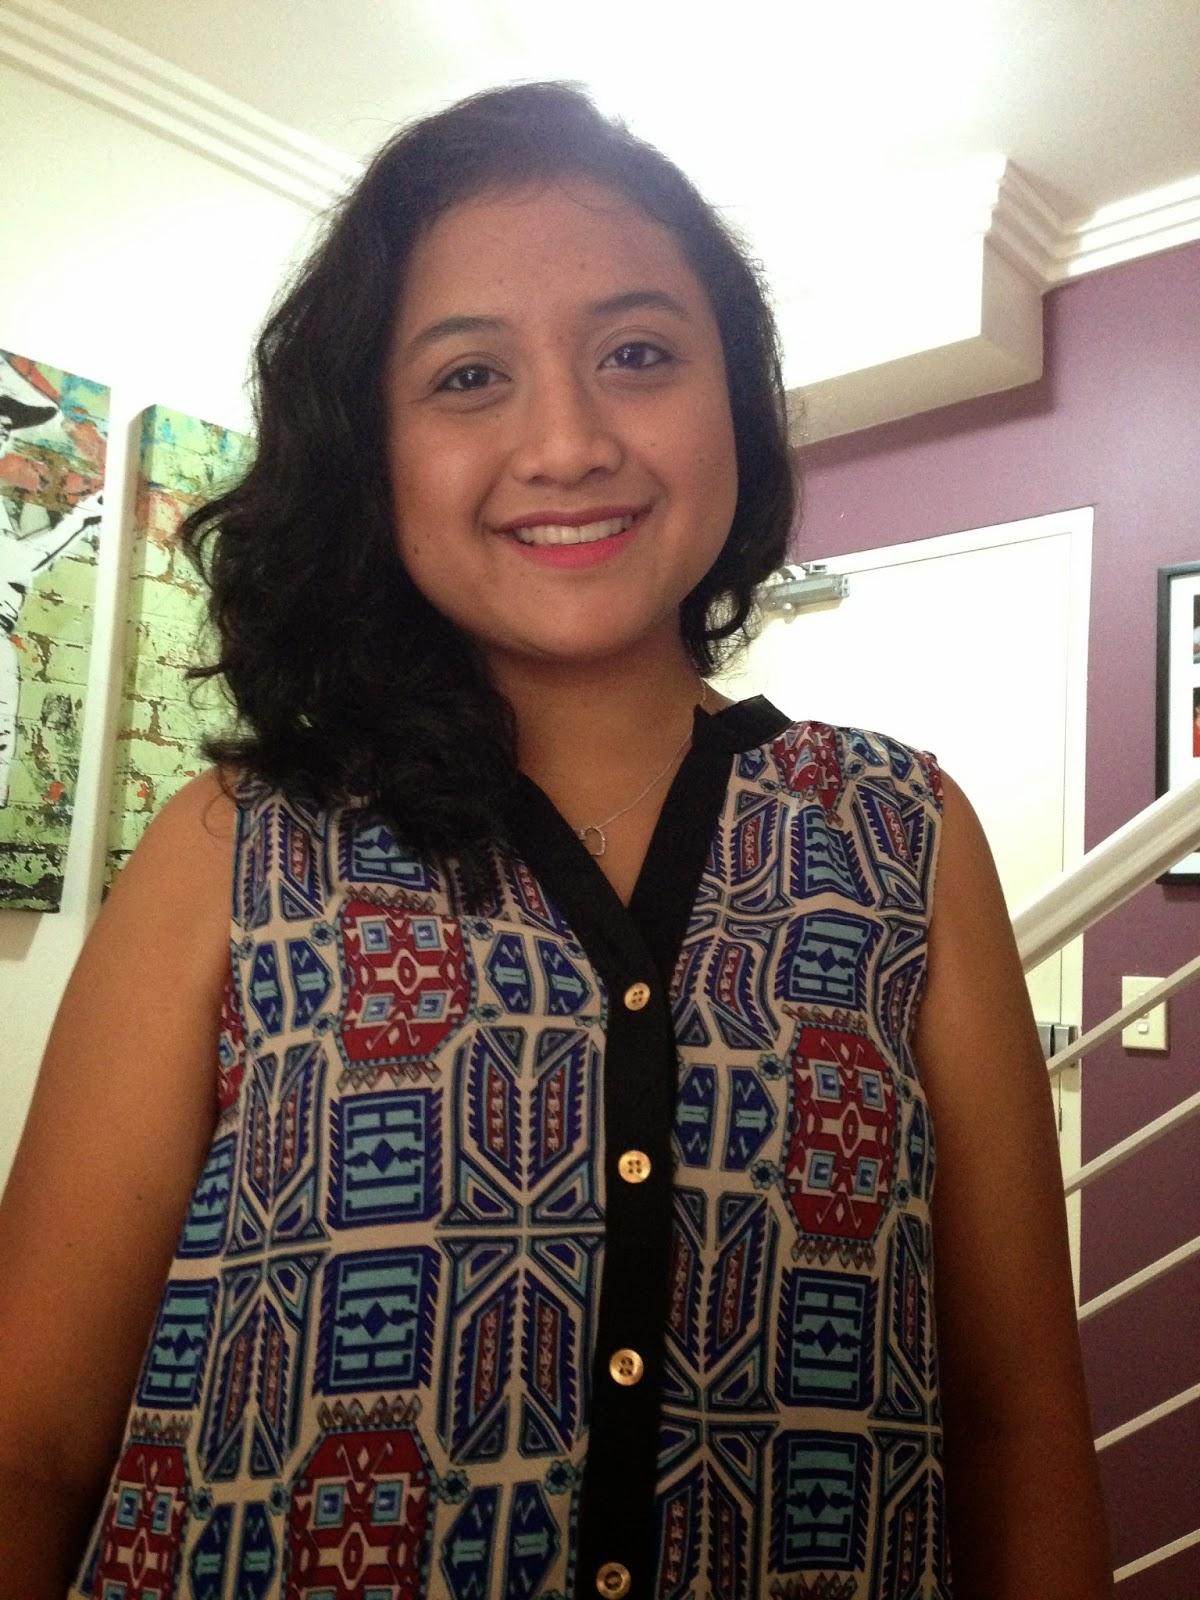 TEMT blouse, simple make up, NYX Soft Matte Lip Cream - San Paulo